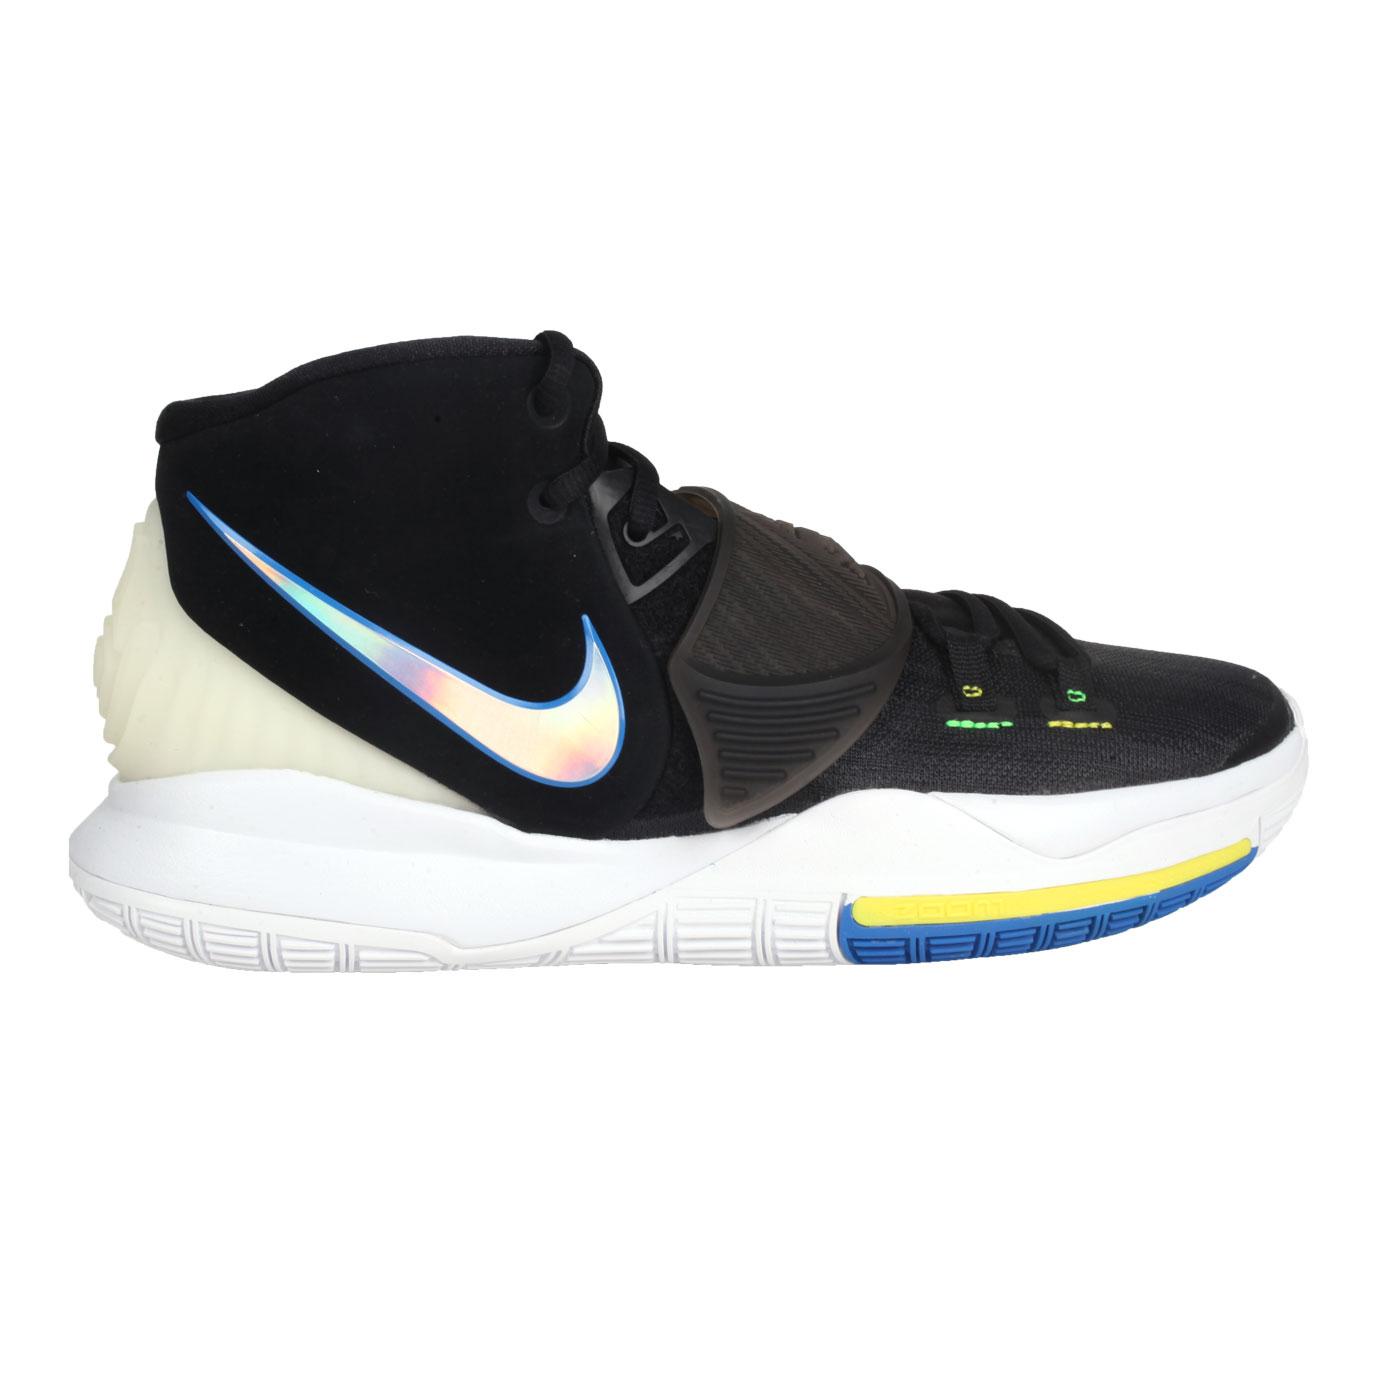 NIKE 男款籃球鞋  @KYRIE 6 EP@BQ4631002 - 黑藍銀